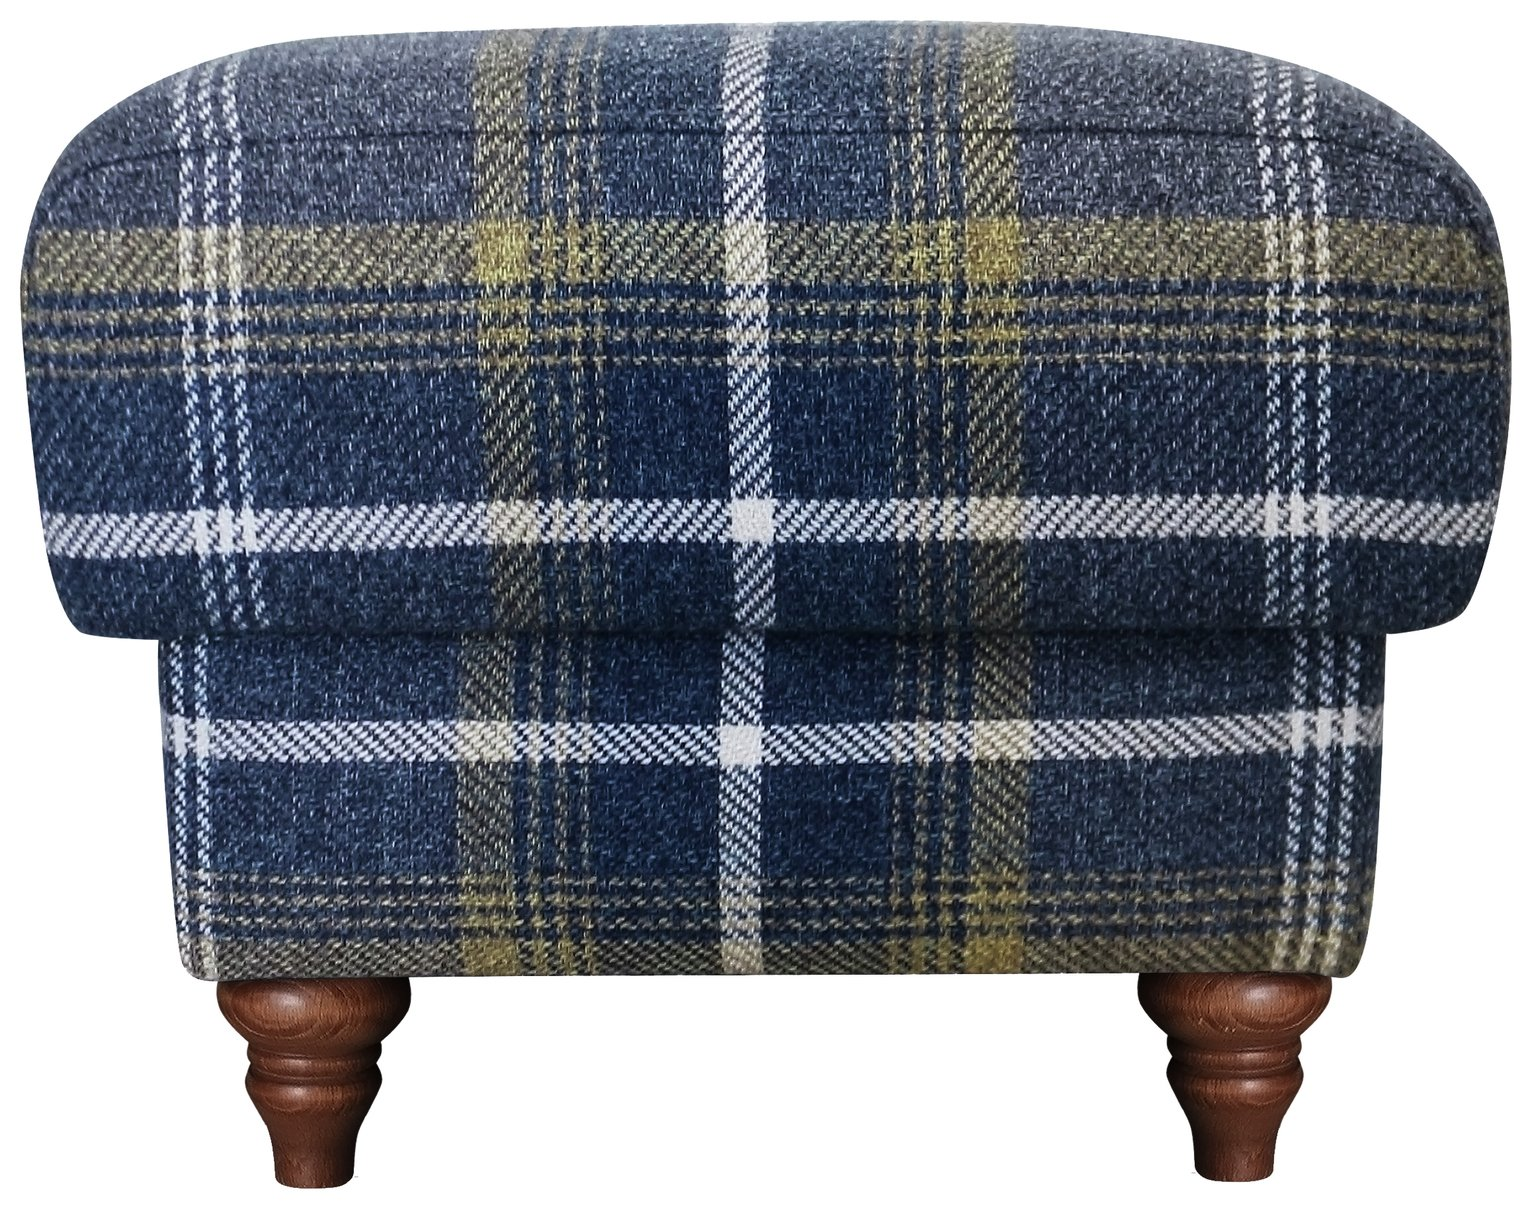 Argos Home Argyll Fabric Storage Footstool - Blue & Yellow